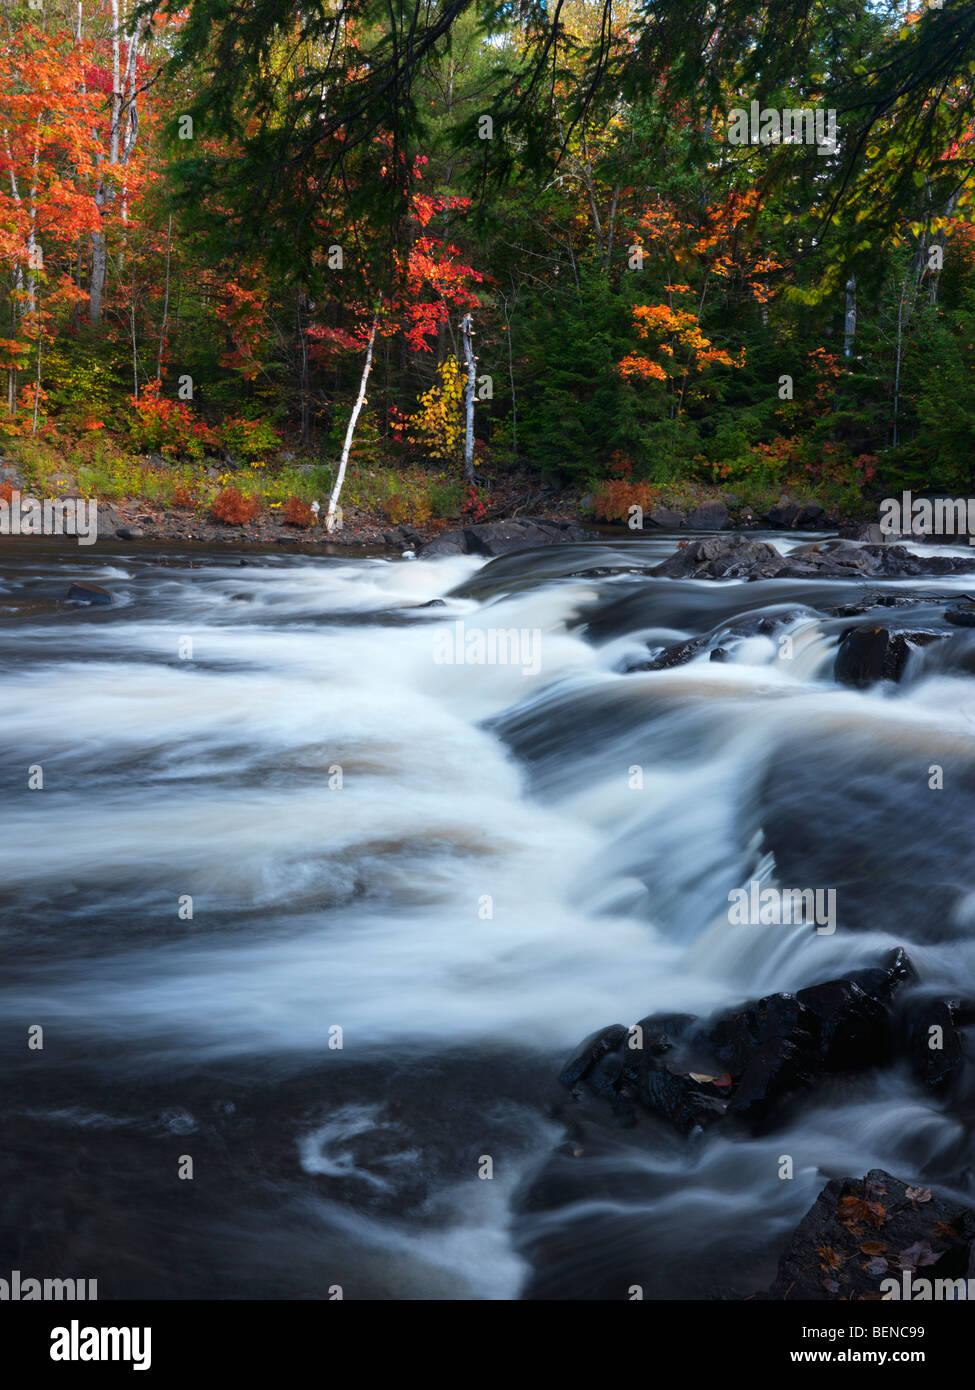 Oxtongue river. Beautiful fall nature scenery. Algonquin, Muskoka, Ontario, Canada. - Stock Image